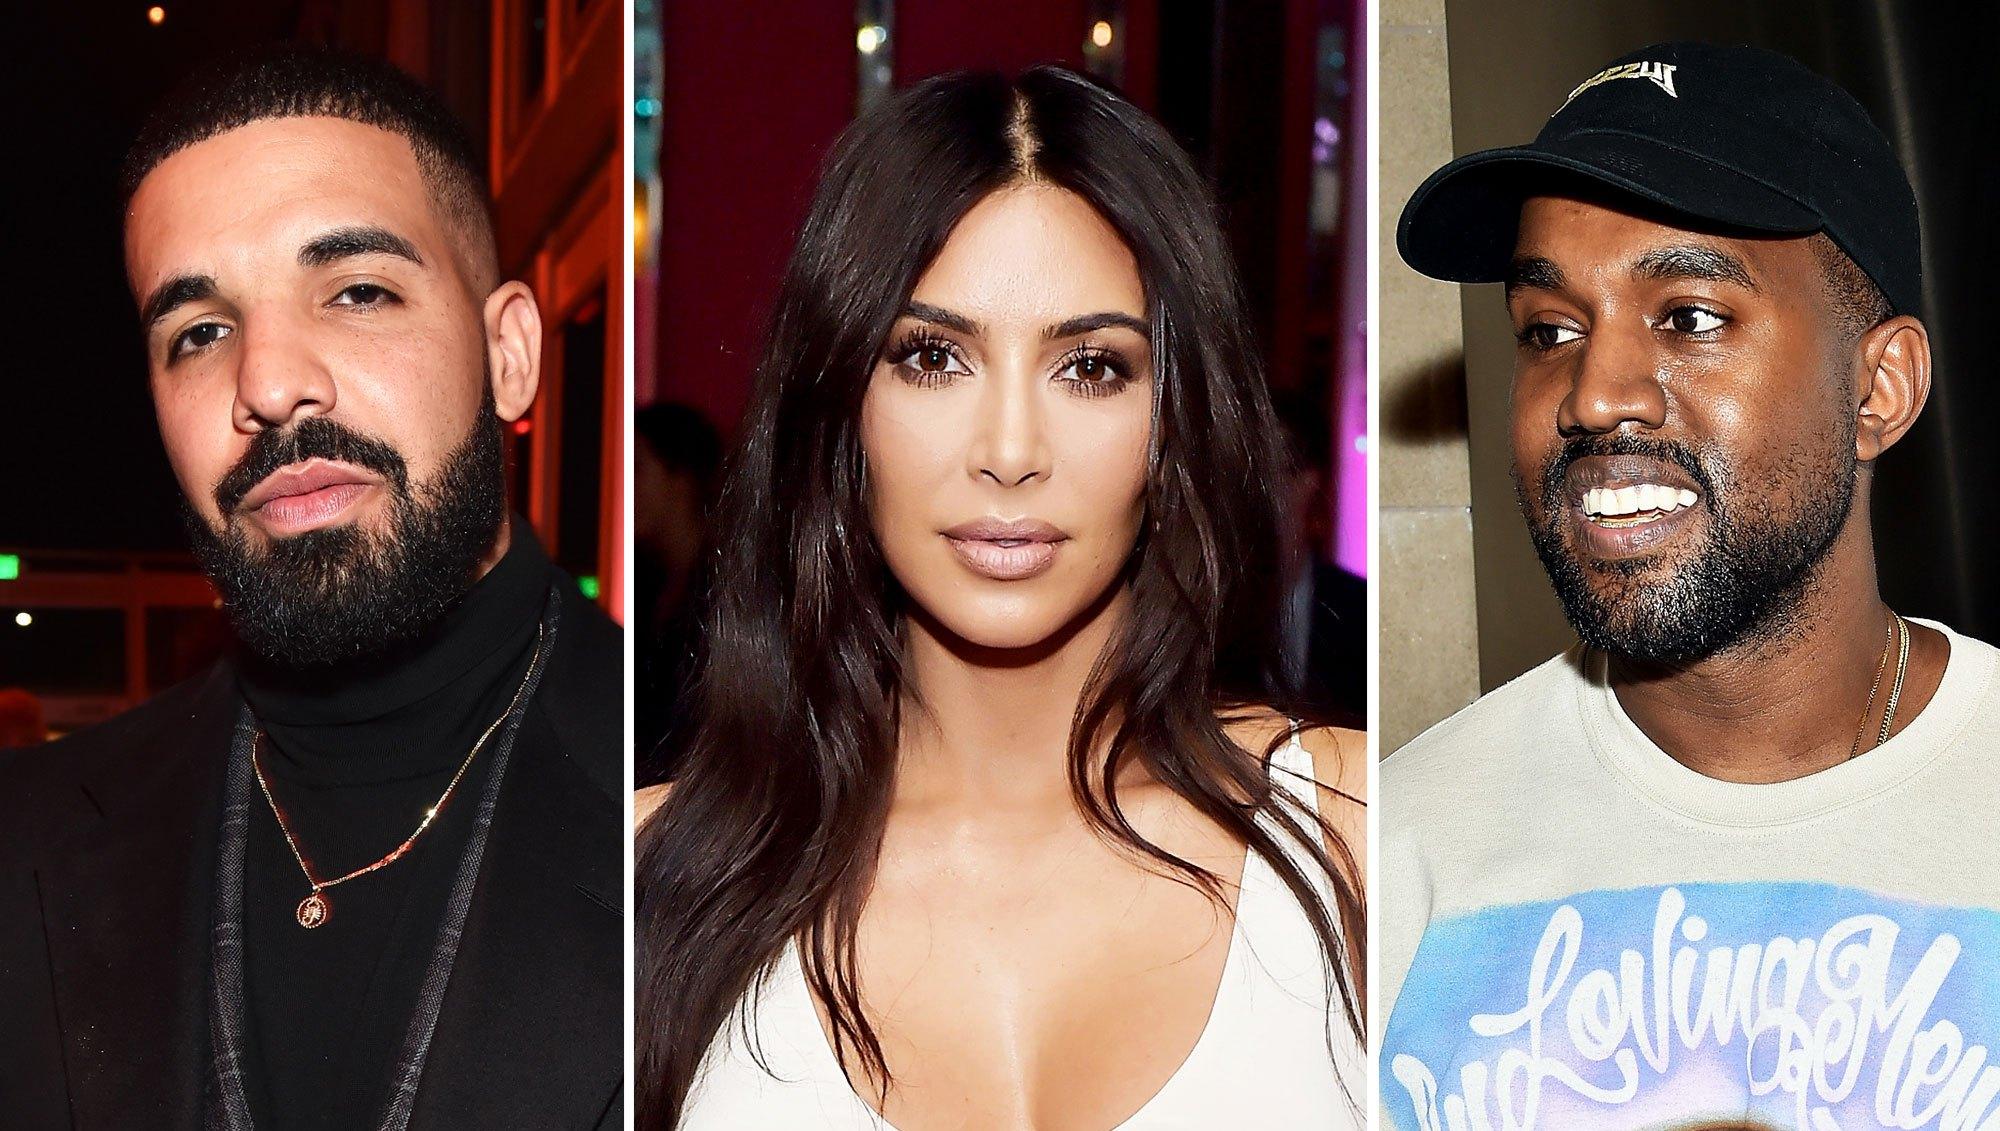 Drake Unfollows Kim Kardashian on Instagram After Kanye West Calls Him Out